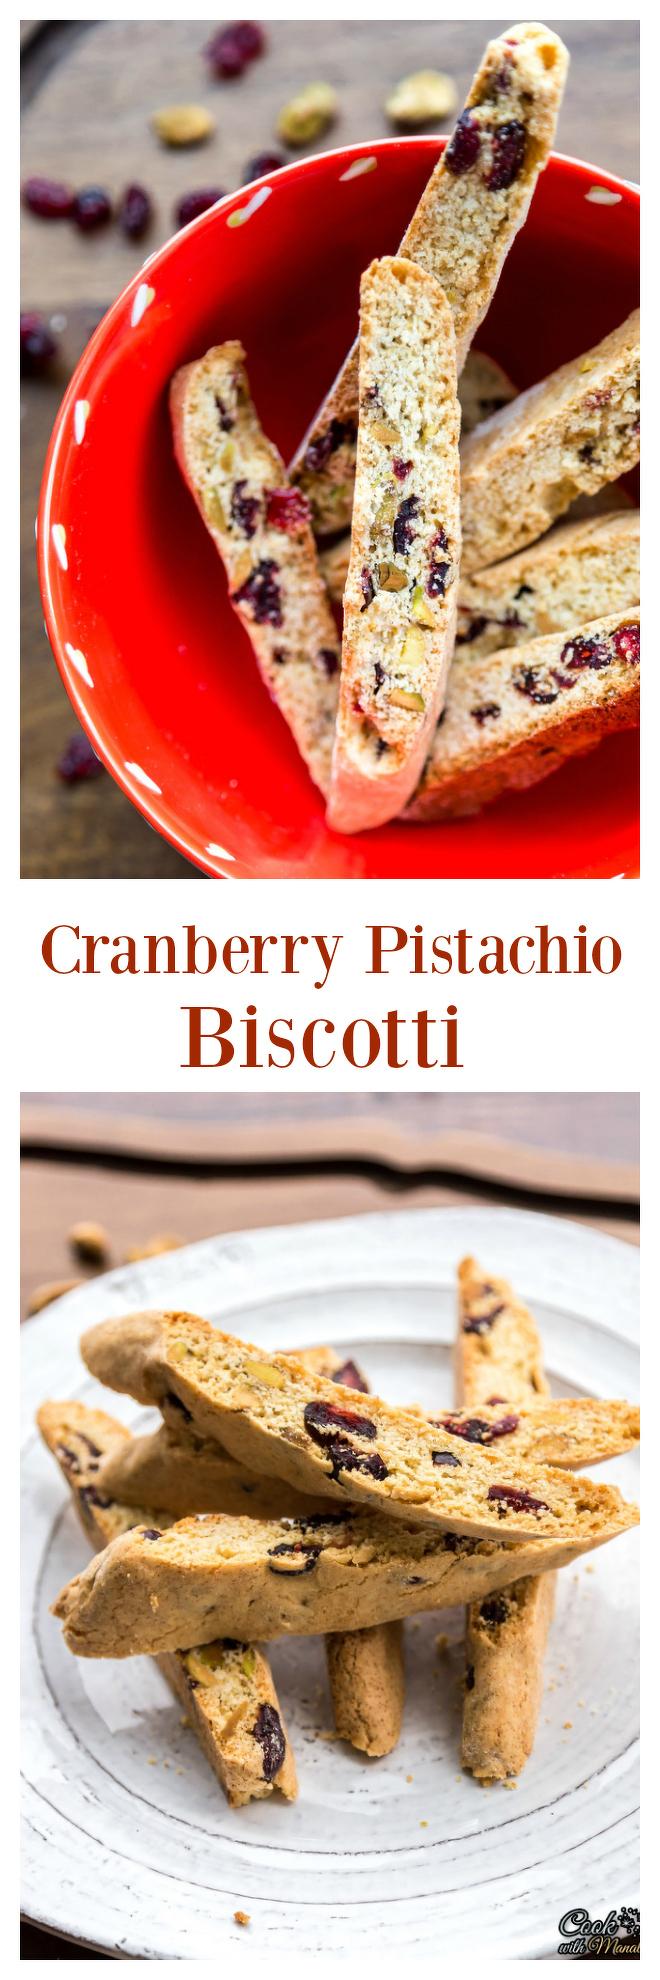 Pistachio-Cranberry-Biscotti Collage-nocwm